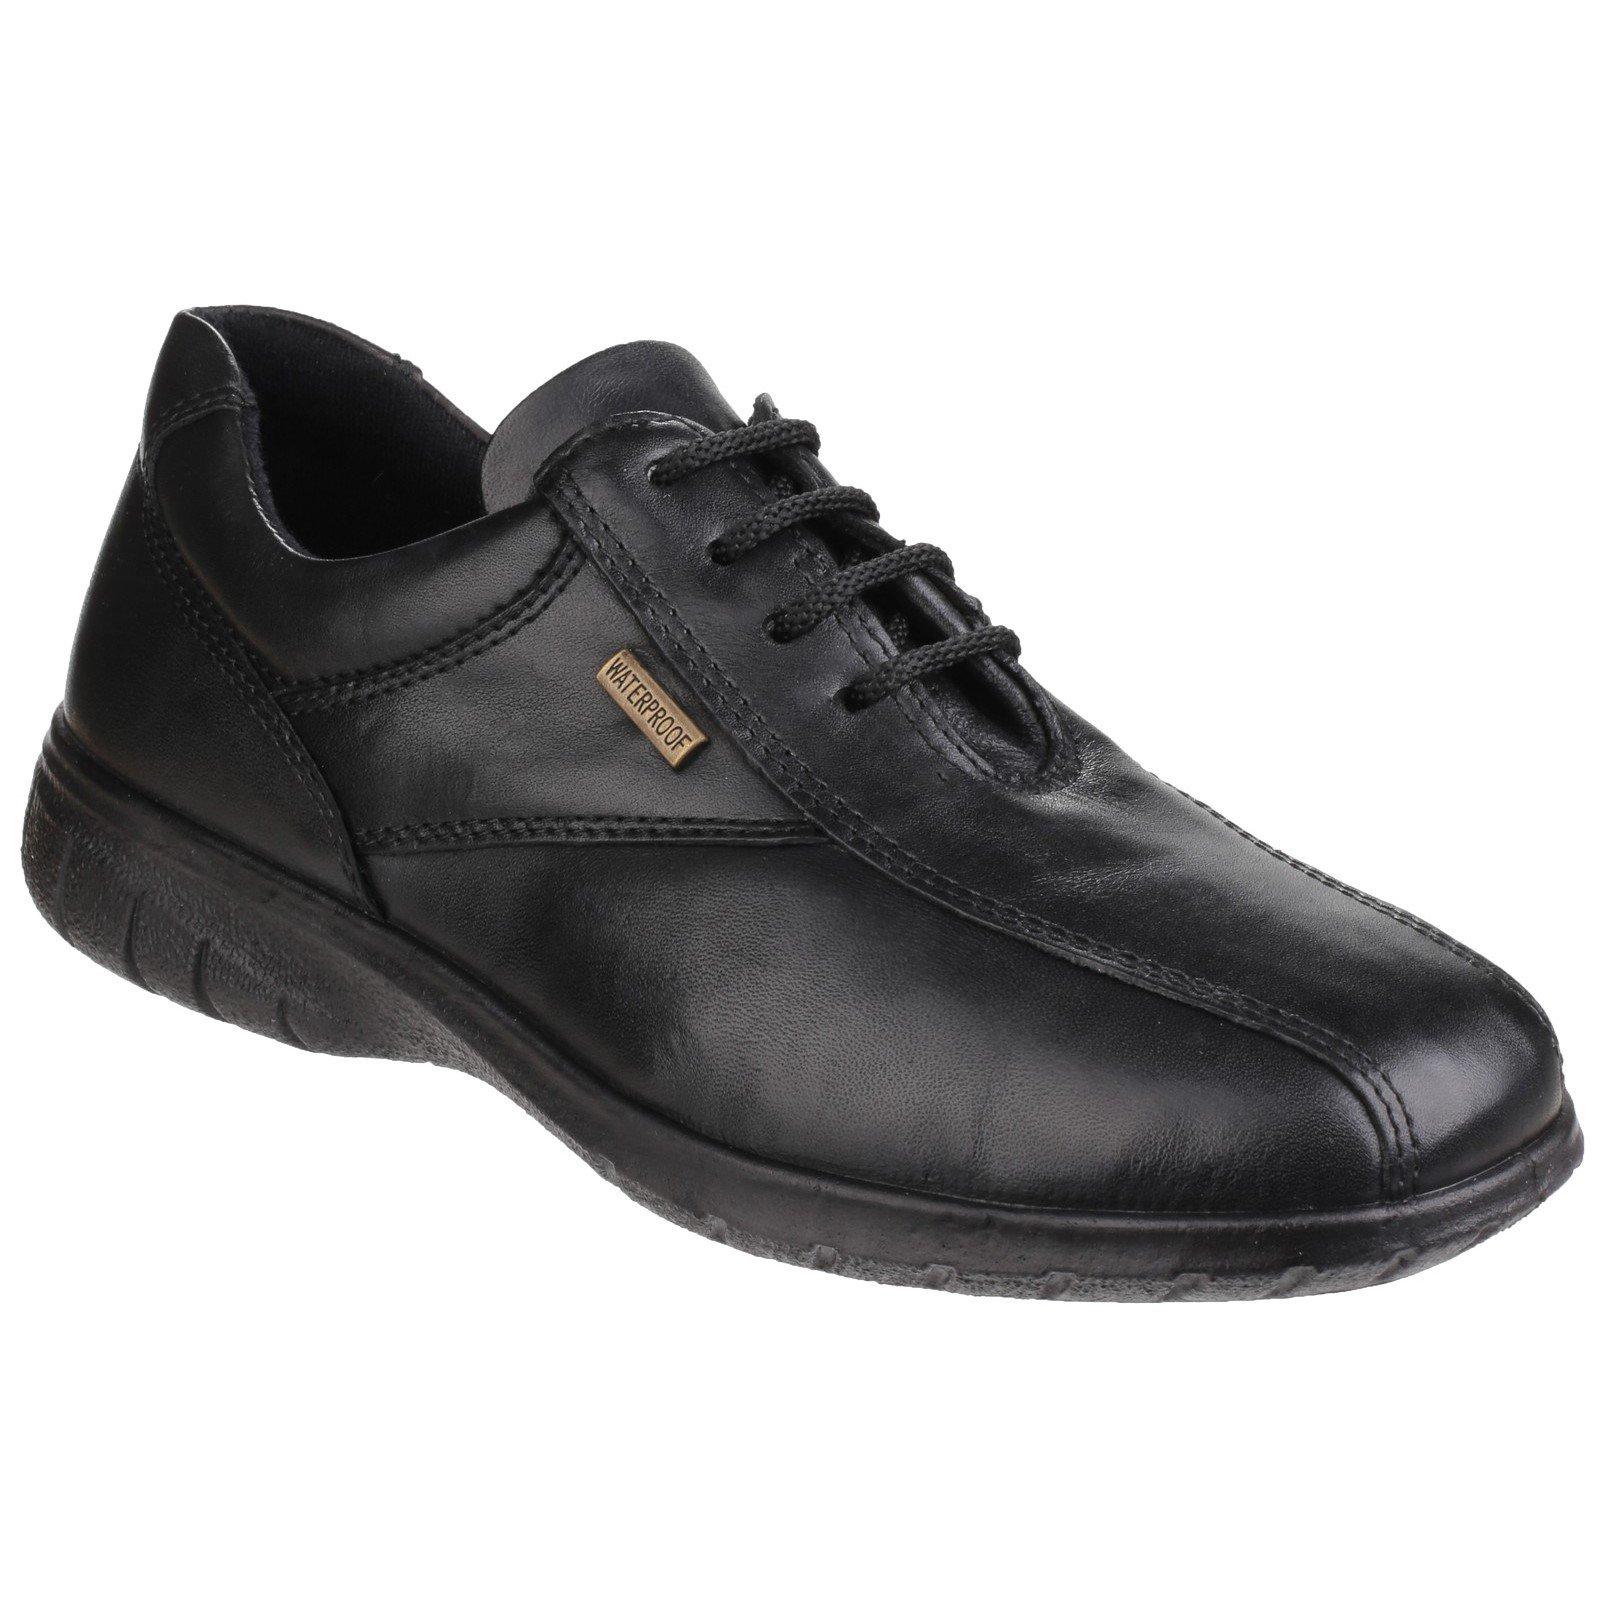 Cotswold Women's Collection Salford Shoe Various Colours 32981 - Black 7